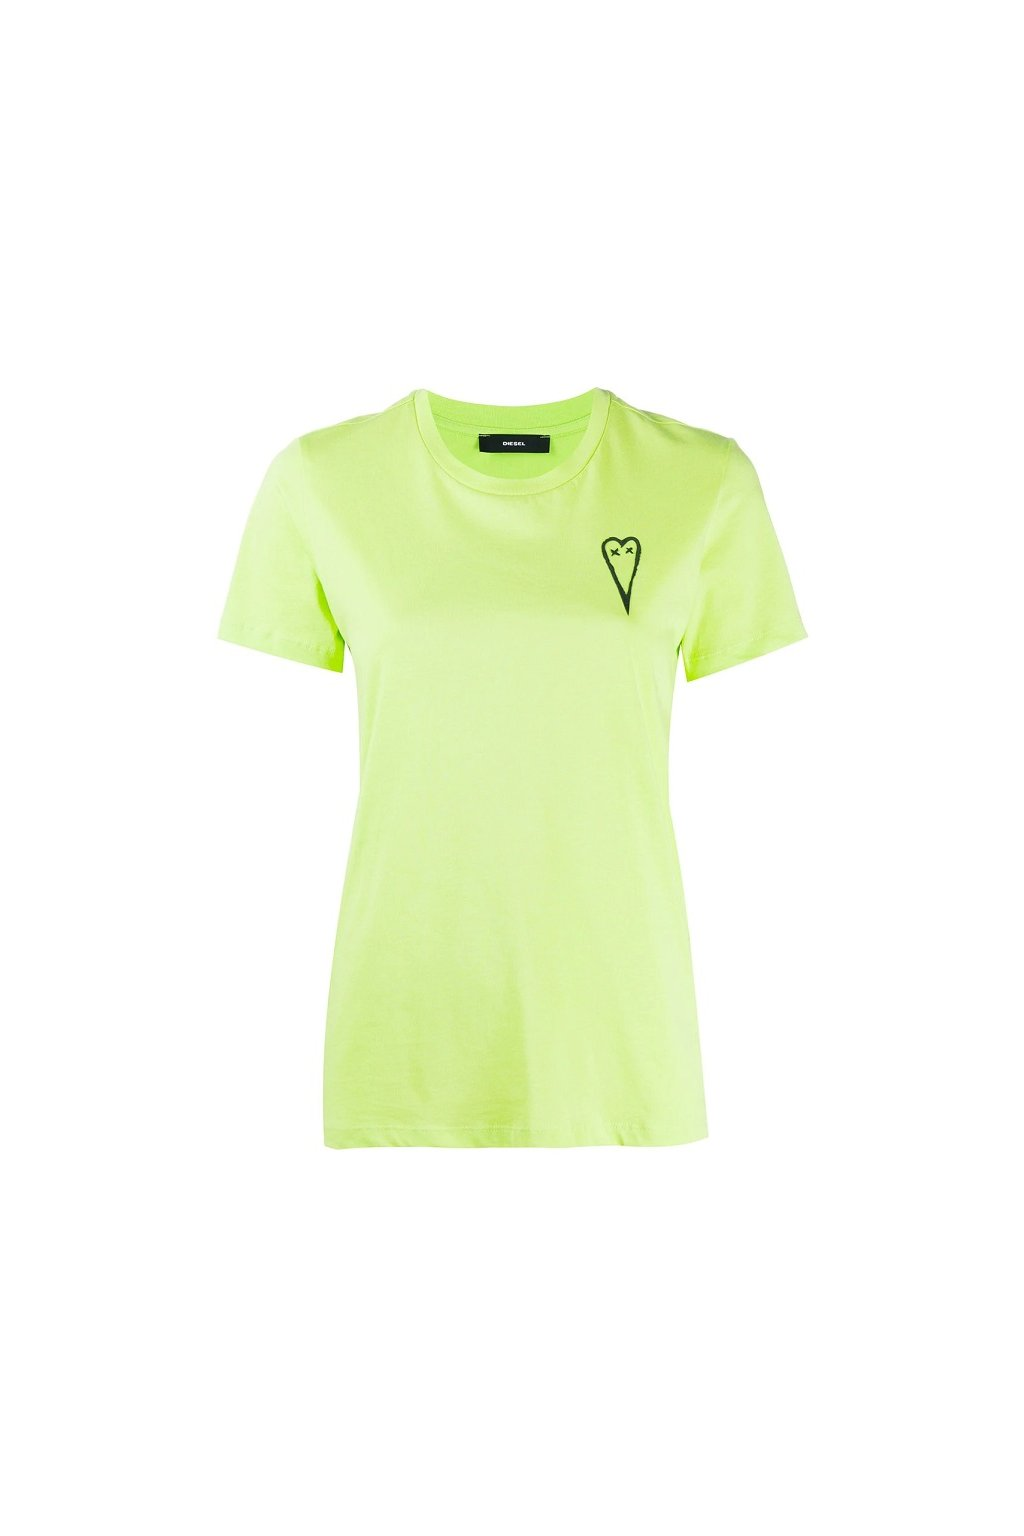 A00251 0HERA Dámské tričko Diesel T Sily žluté